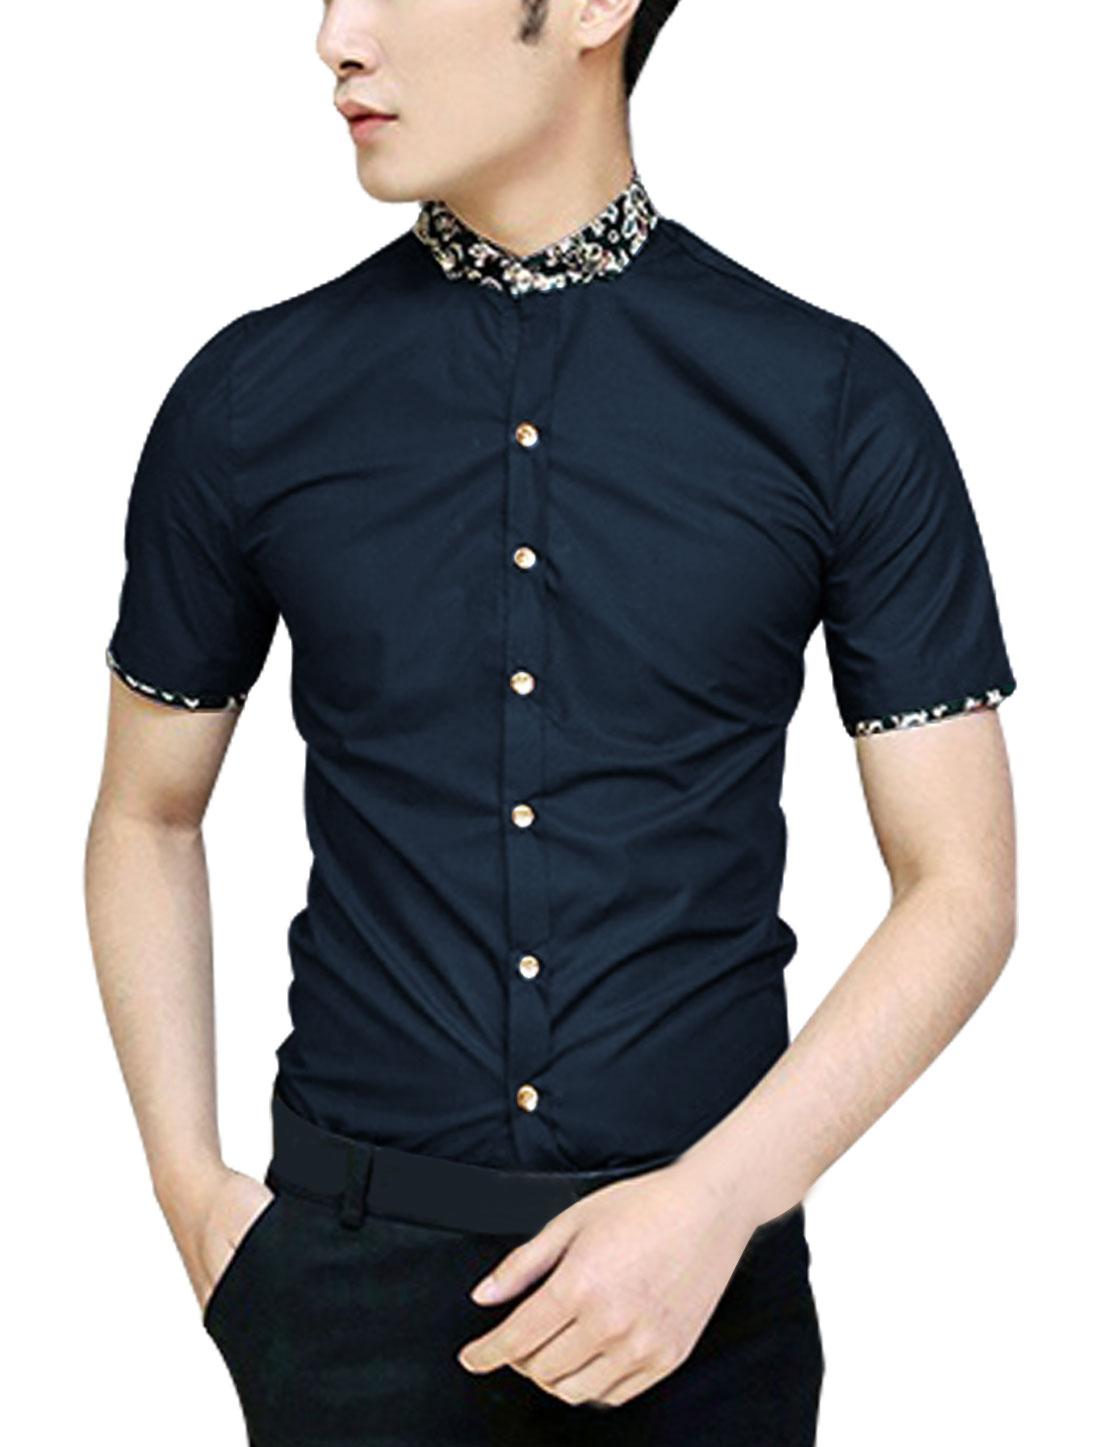 Men Point Collar Floral Prints Detail Button Up Shirt Dark Blue S